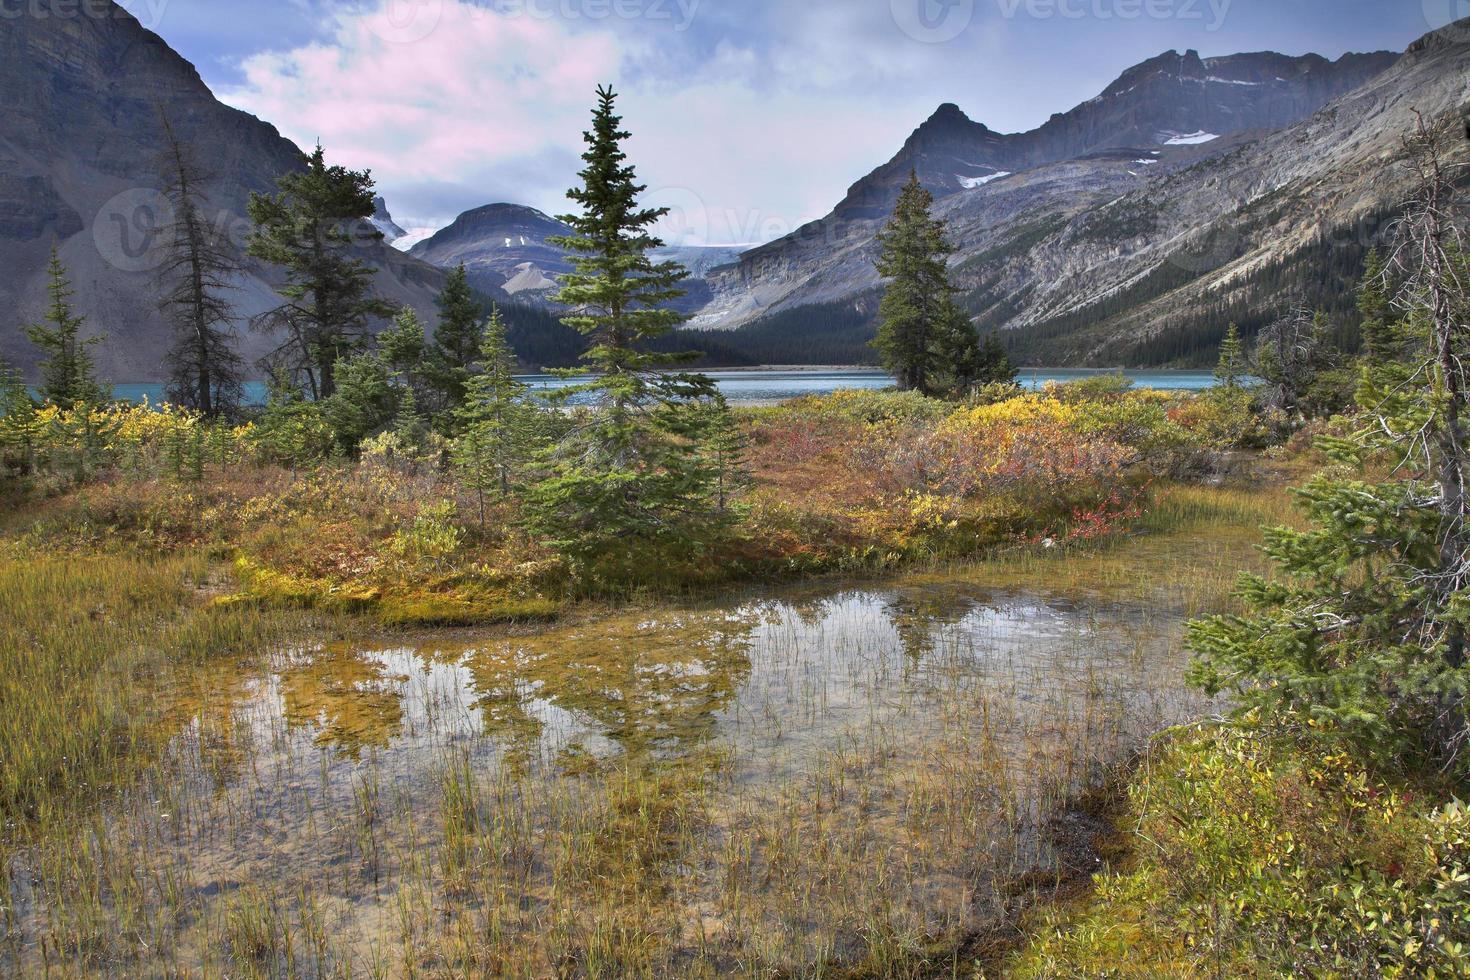 Turquoise lake and orange grass. photo